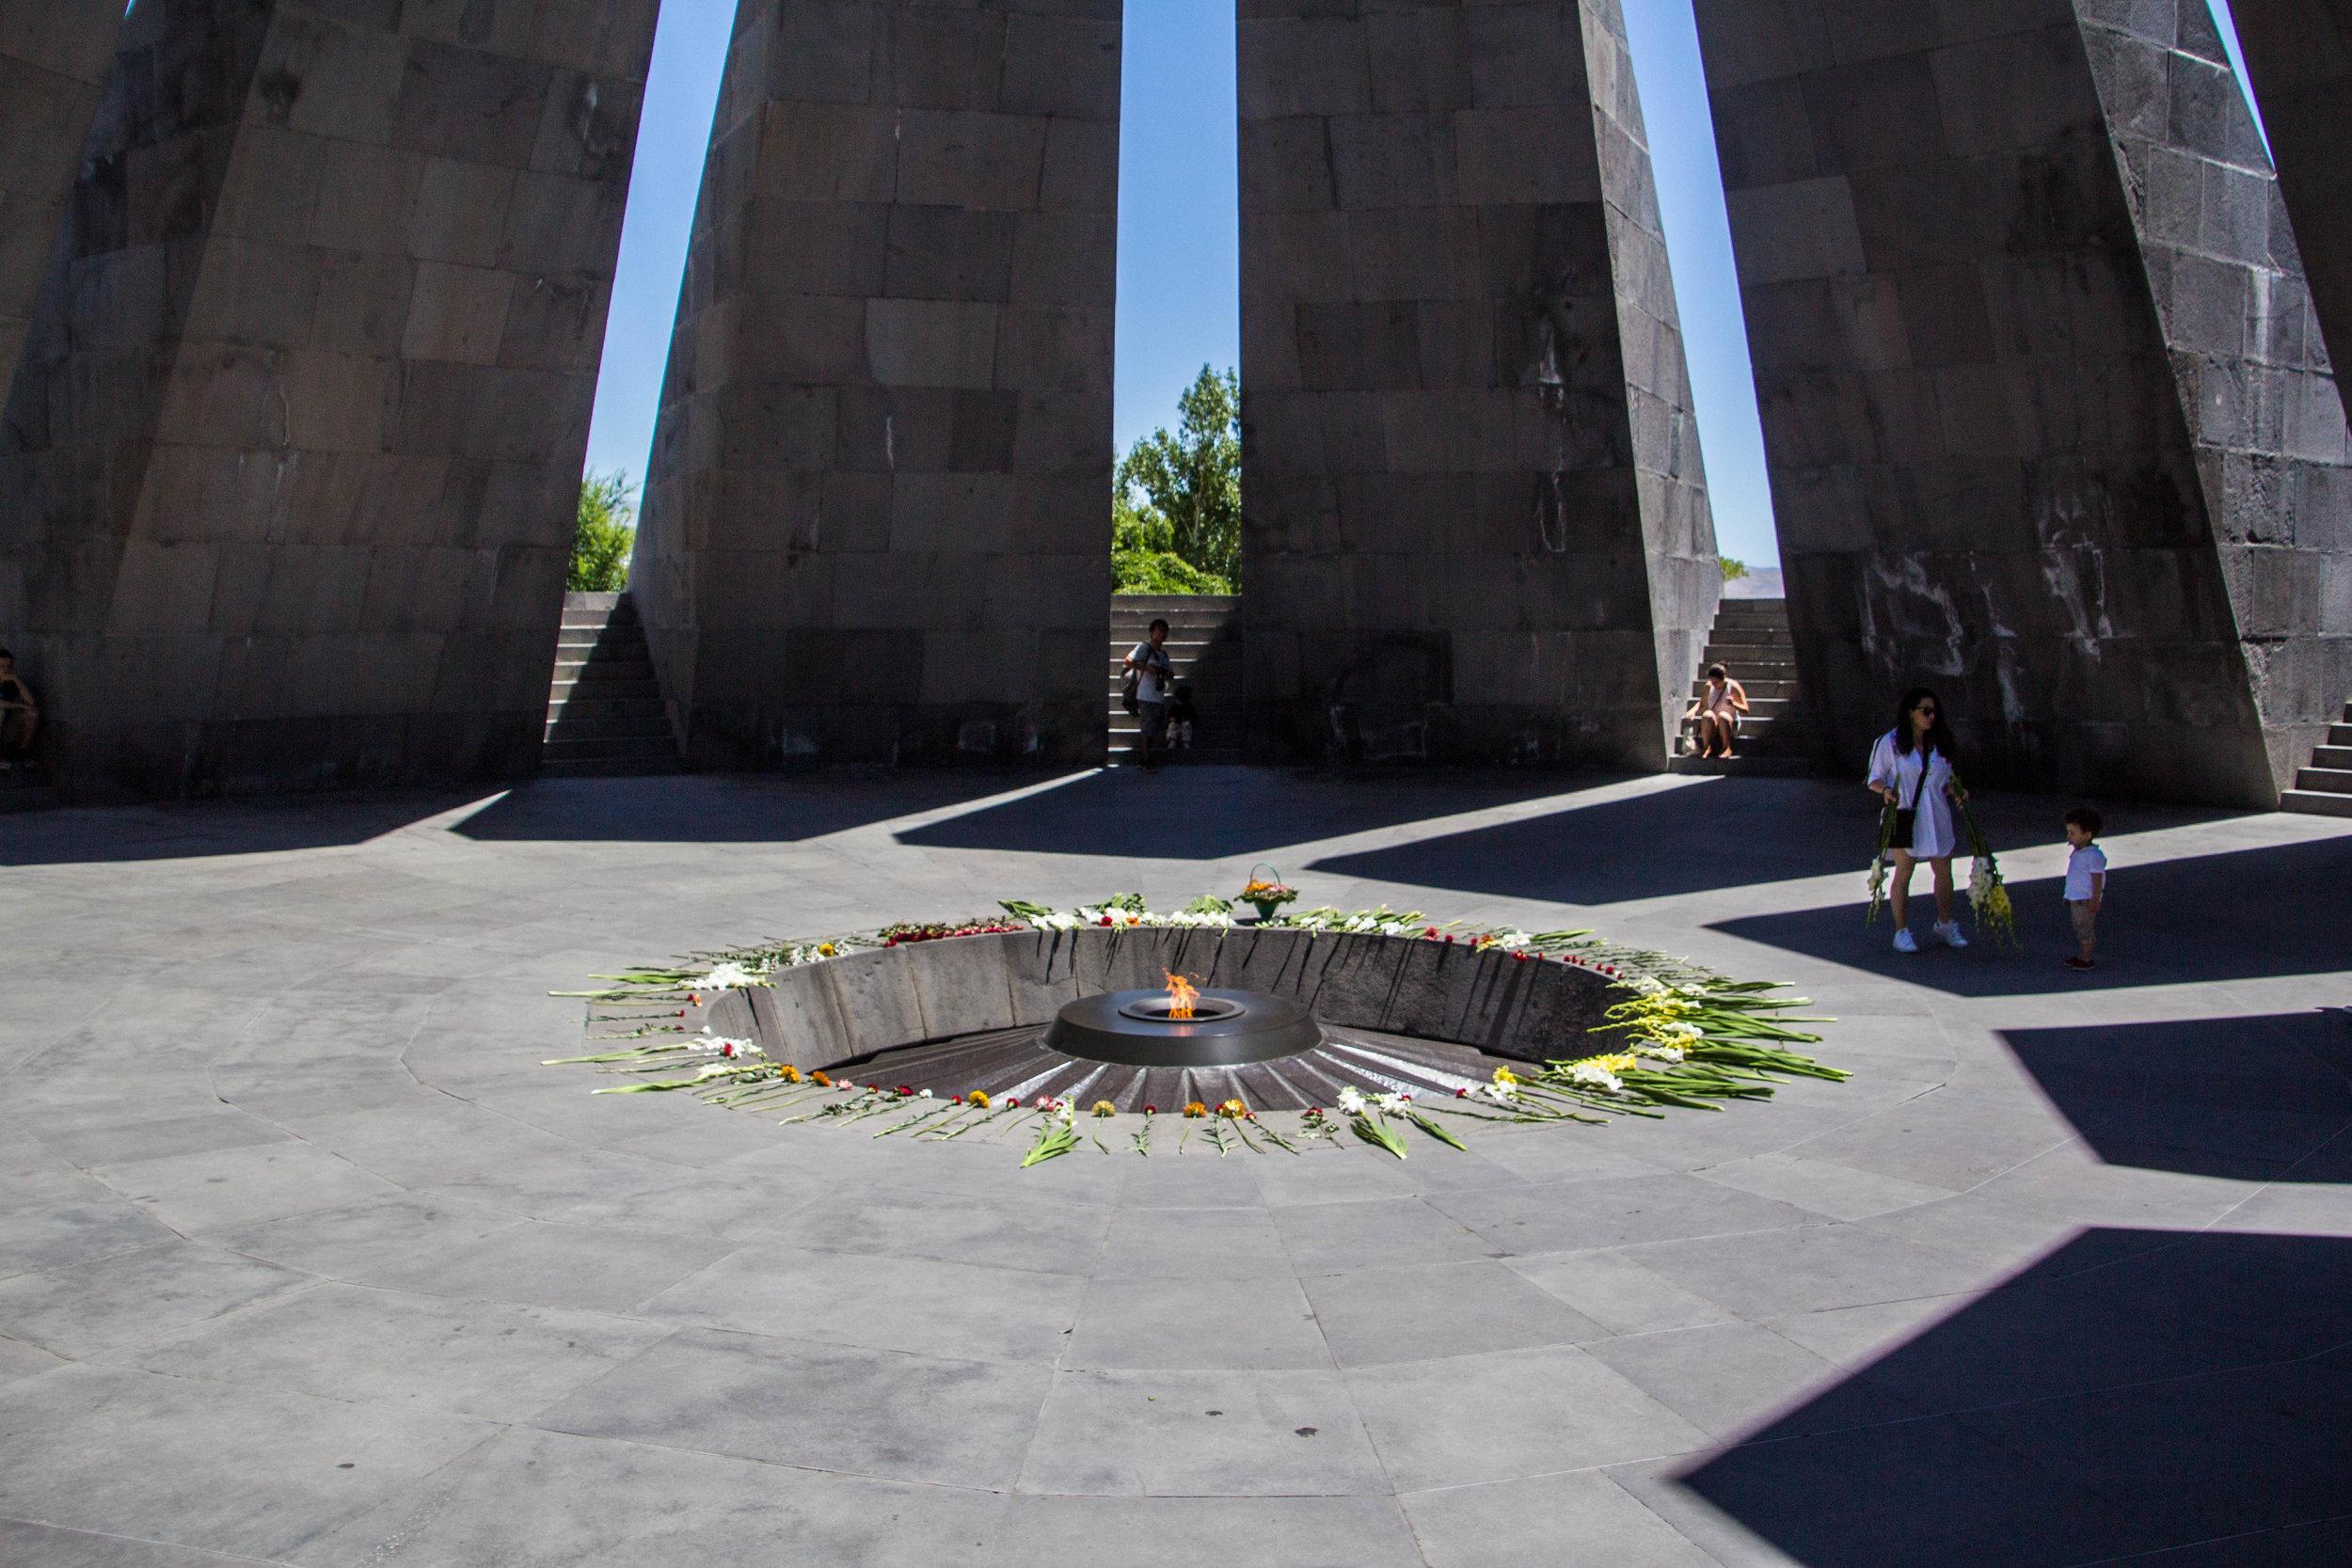 tsitsernakaberd-armenian-genocide-memorial-22.jpg